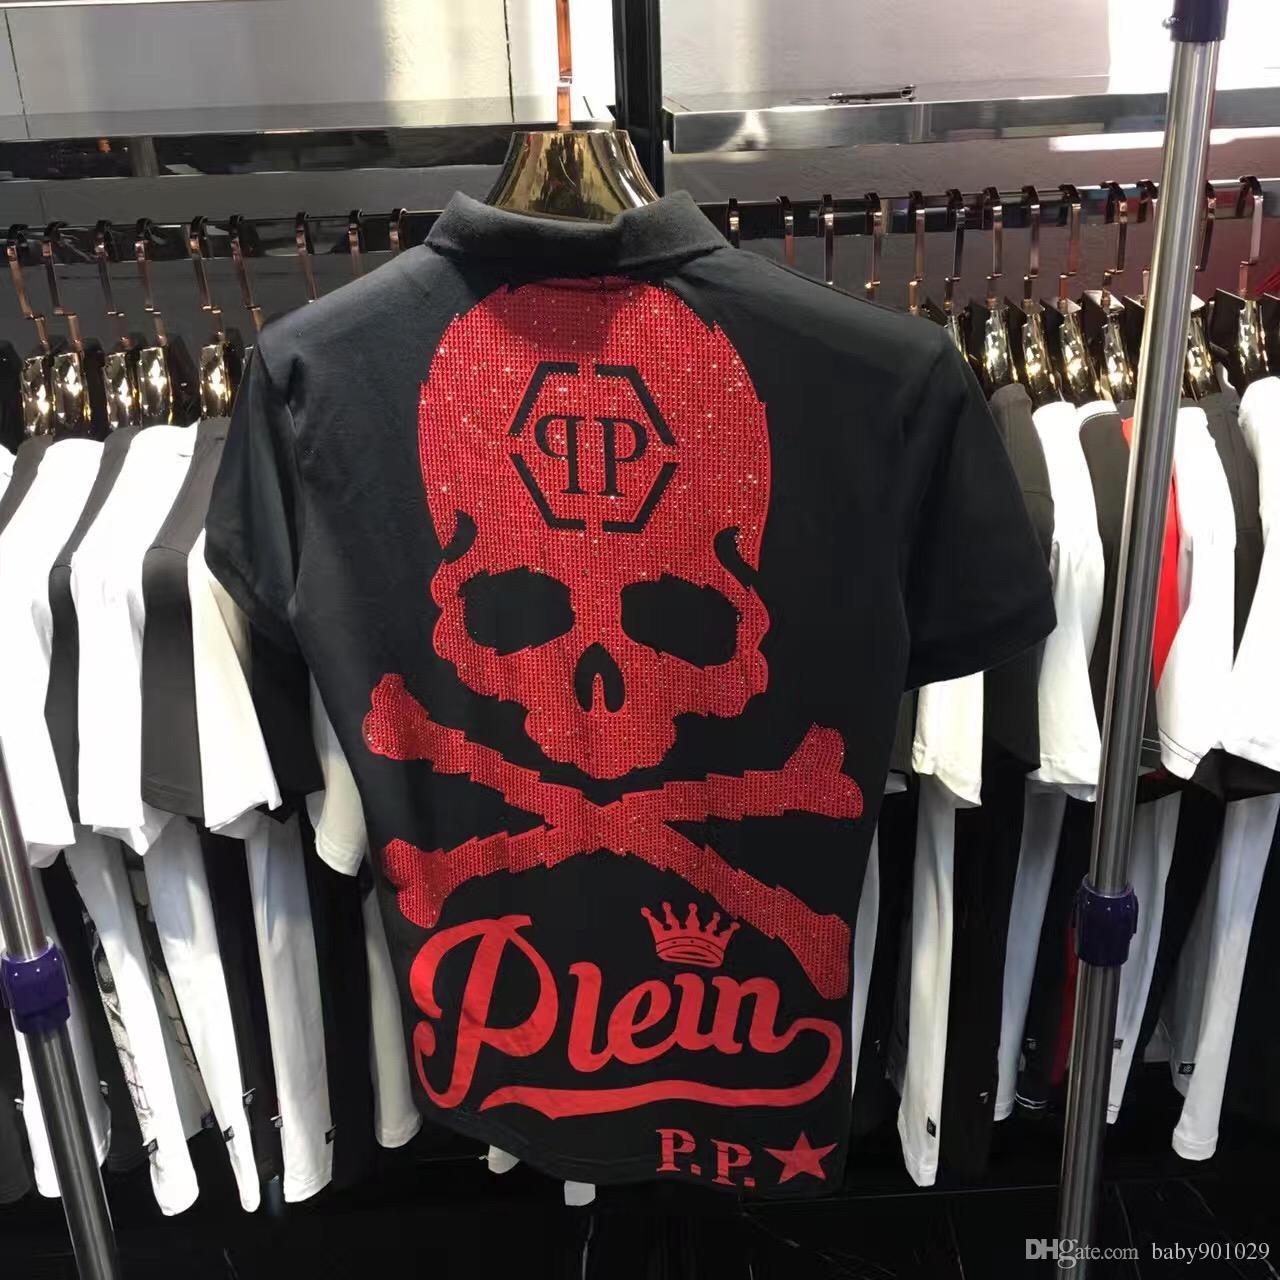 T shirt design hip hop - 2017 2016 German Brand Men S Lapel Neck Short Sleeve T Shirt Fashion Crime Design Skull Hip Hop High Quality Medusa Philipp Plein T Shirt Pp3 From